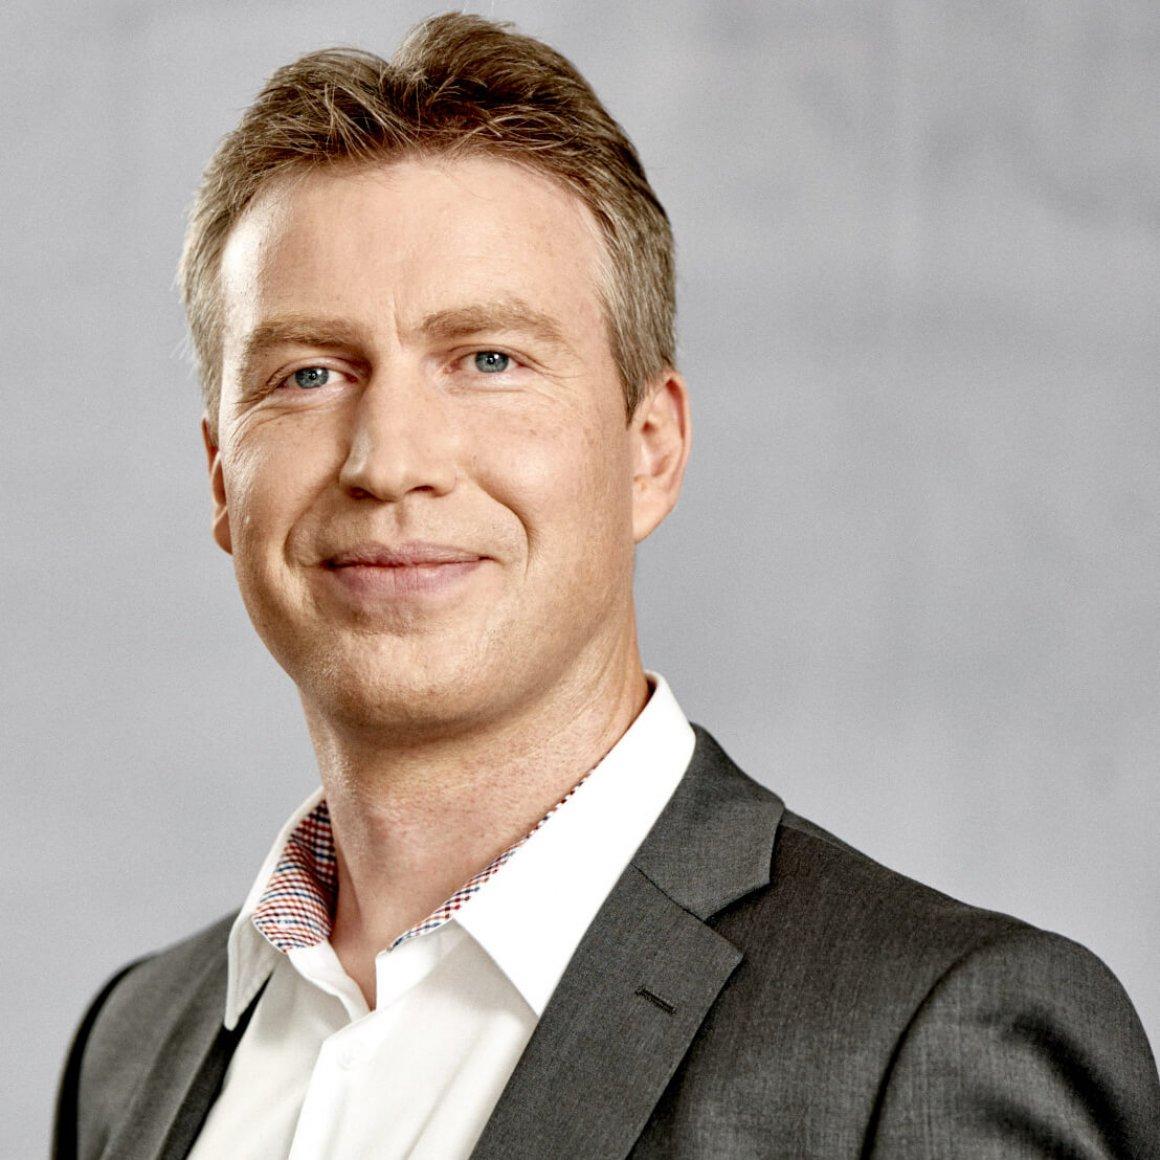 Robert Wauer, CBDO relemind GmbH